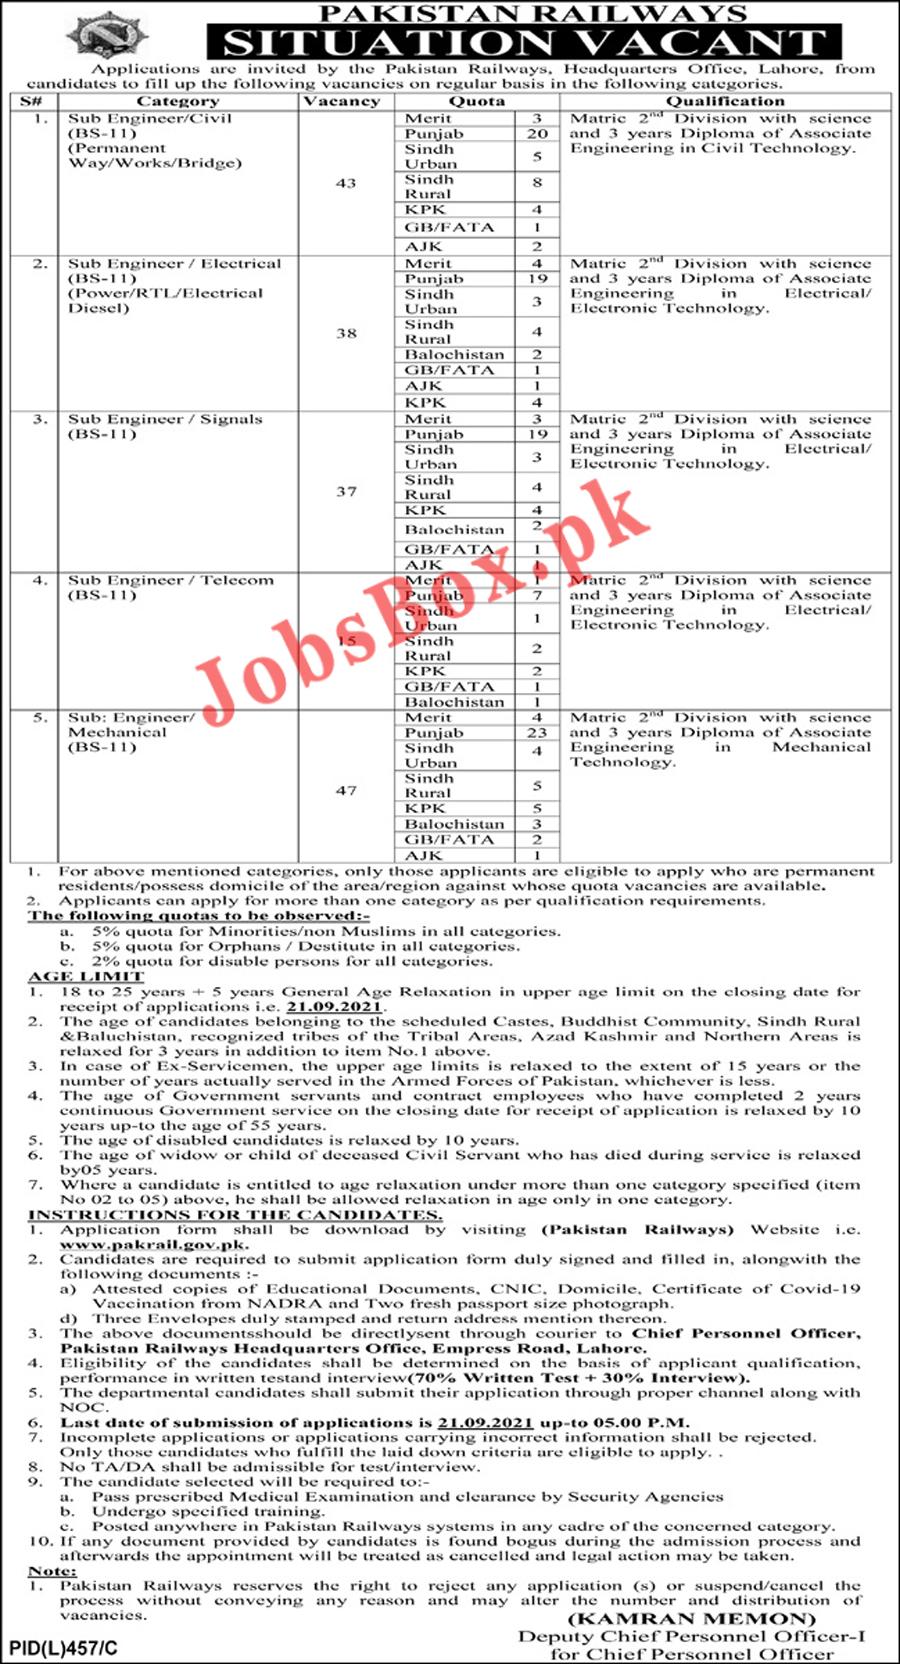 www.pakrail.gov.pk - Railway Jobs 2021 - Pak Railway Jobs 2021 - Pakistan Railway Jobs 2021 - New Railway Jobs 2021